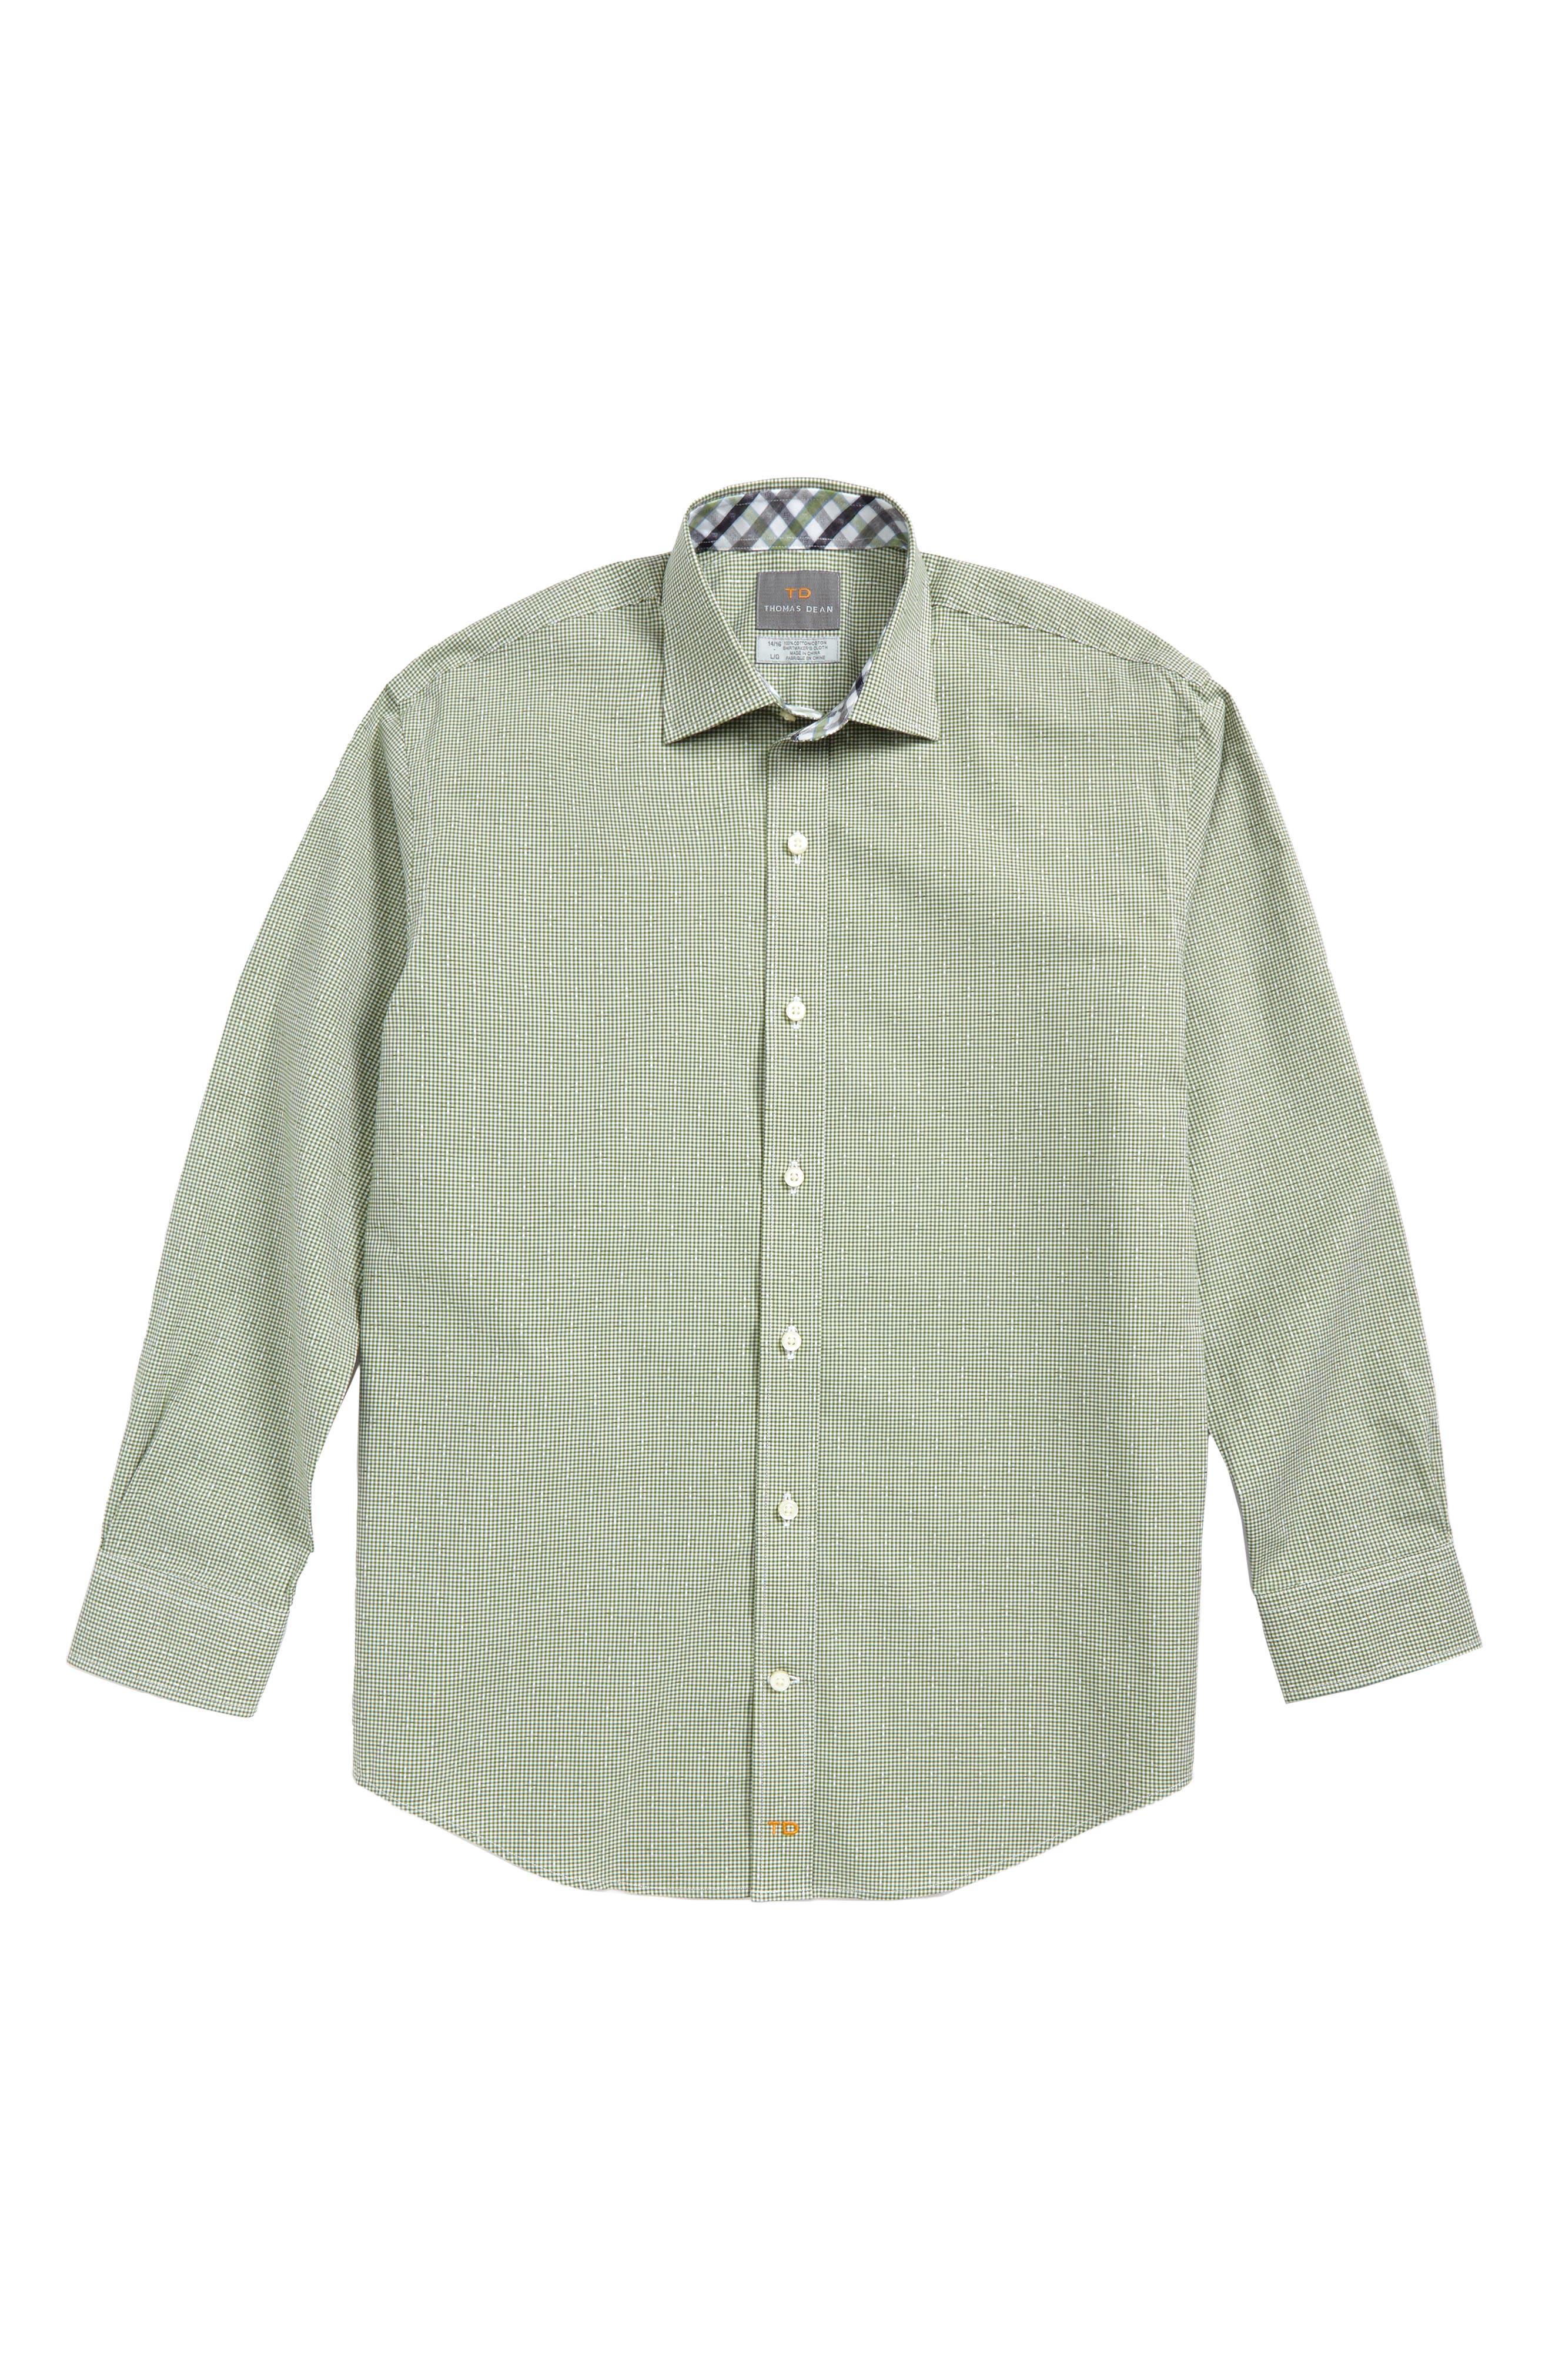 Main Image - Thomas Dean Microcheck Dress Shirt (Big Boys)